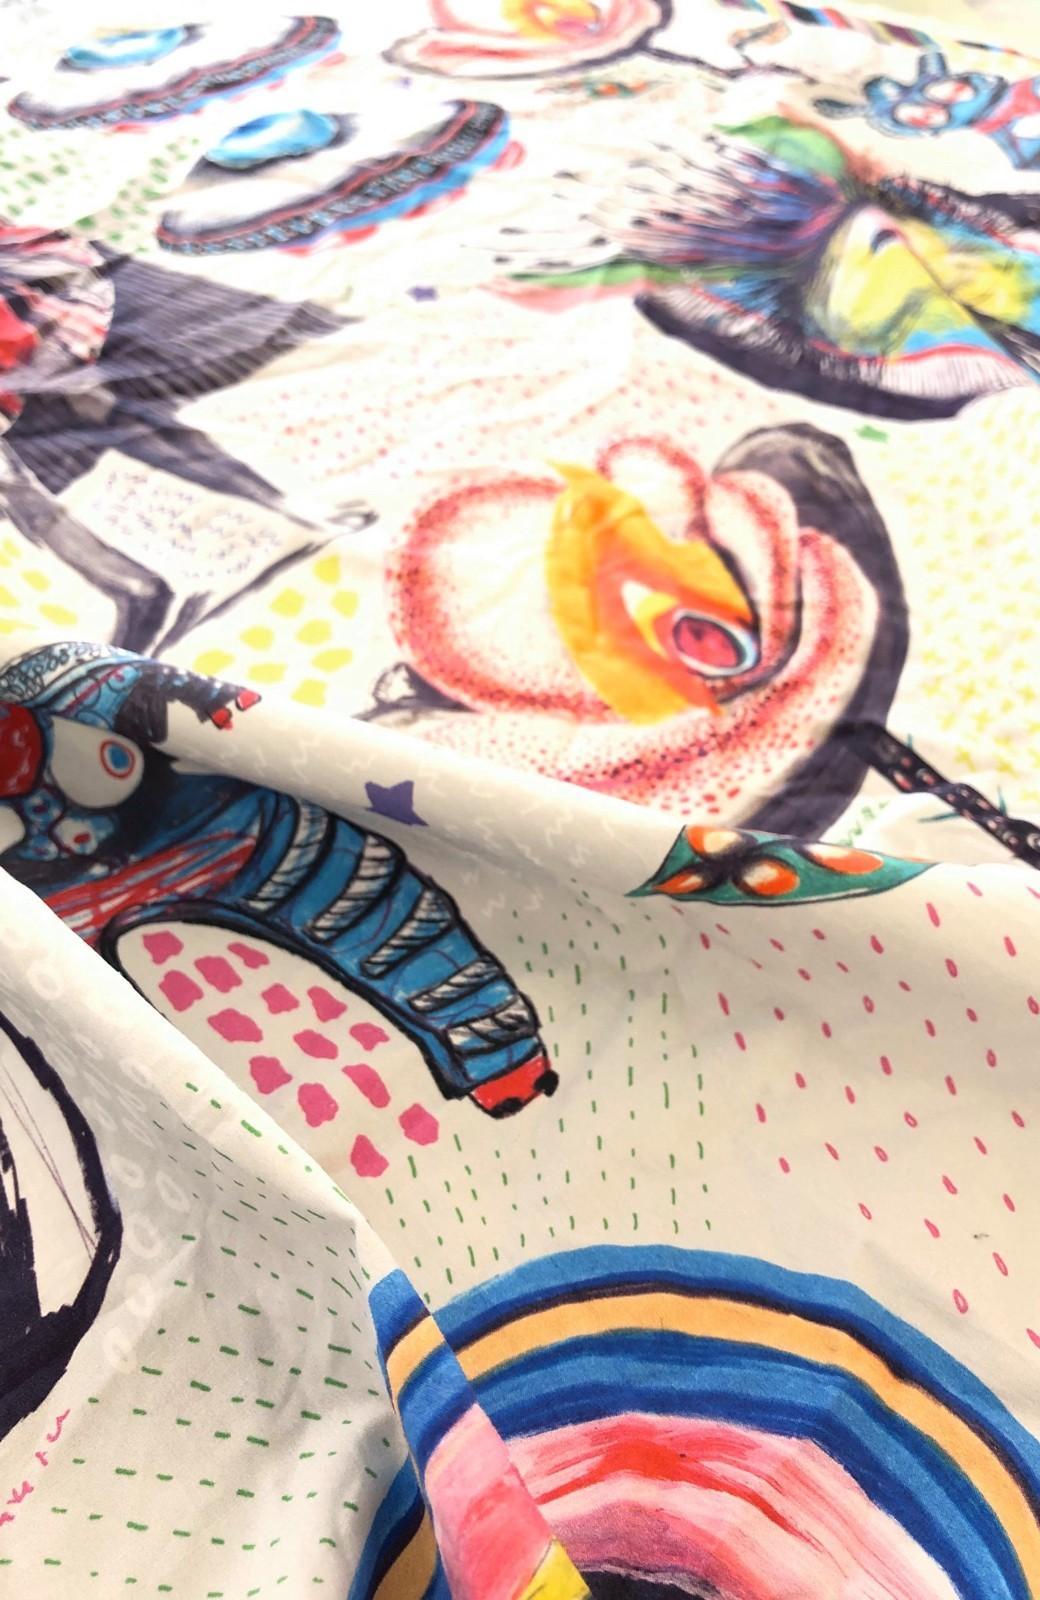 haco! [haco! POST]マスクだって服が着たい!RBTXCOさんのテキスタイルでマスクが華やぐ マスクのお洋服型紙と布セット <その他>の商品写真4